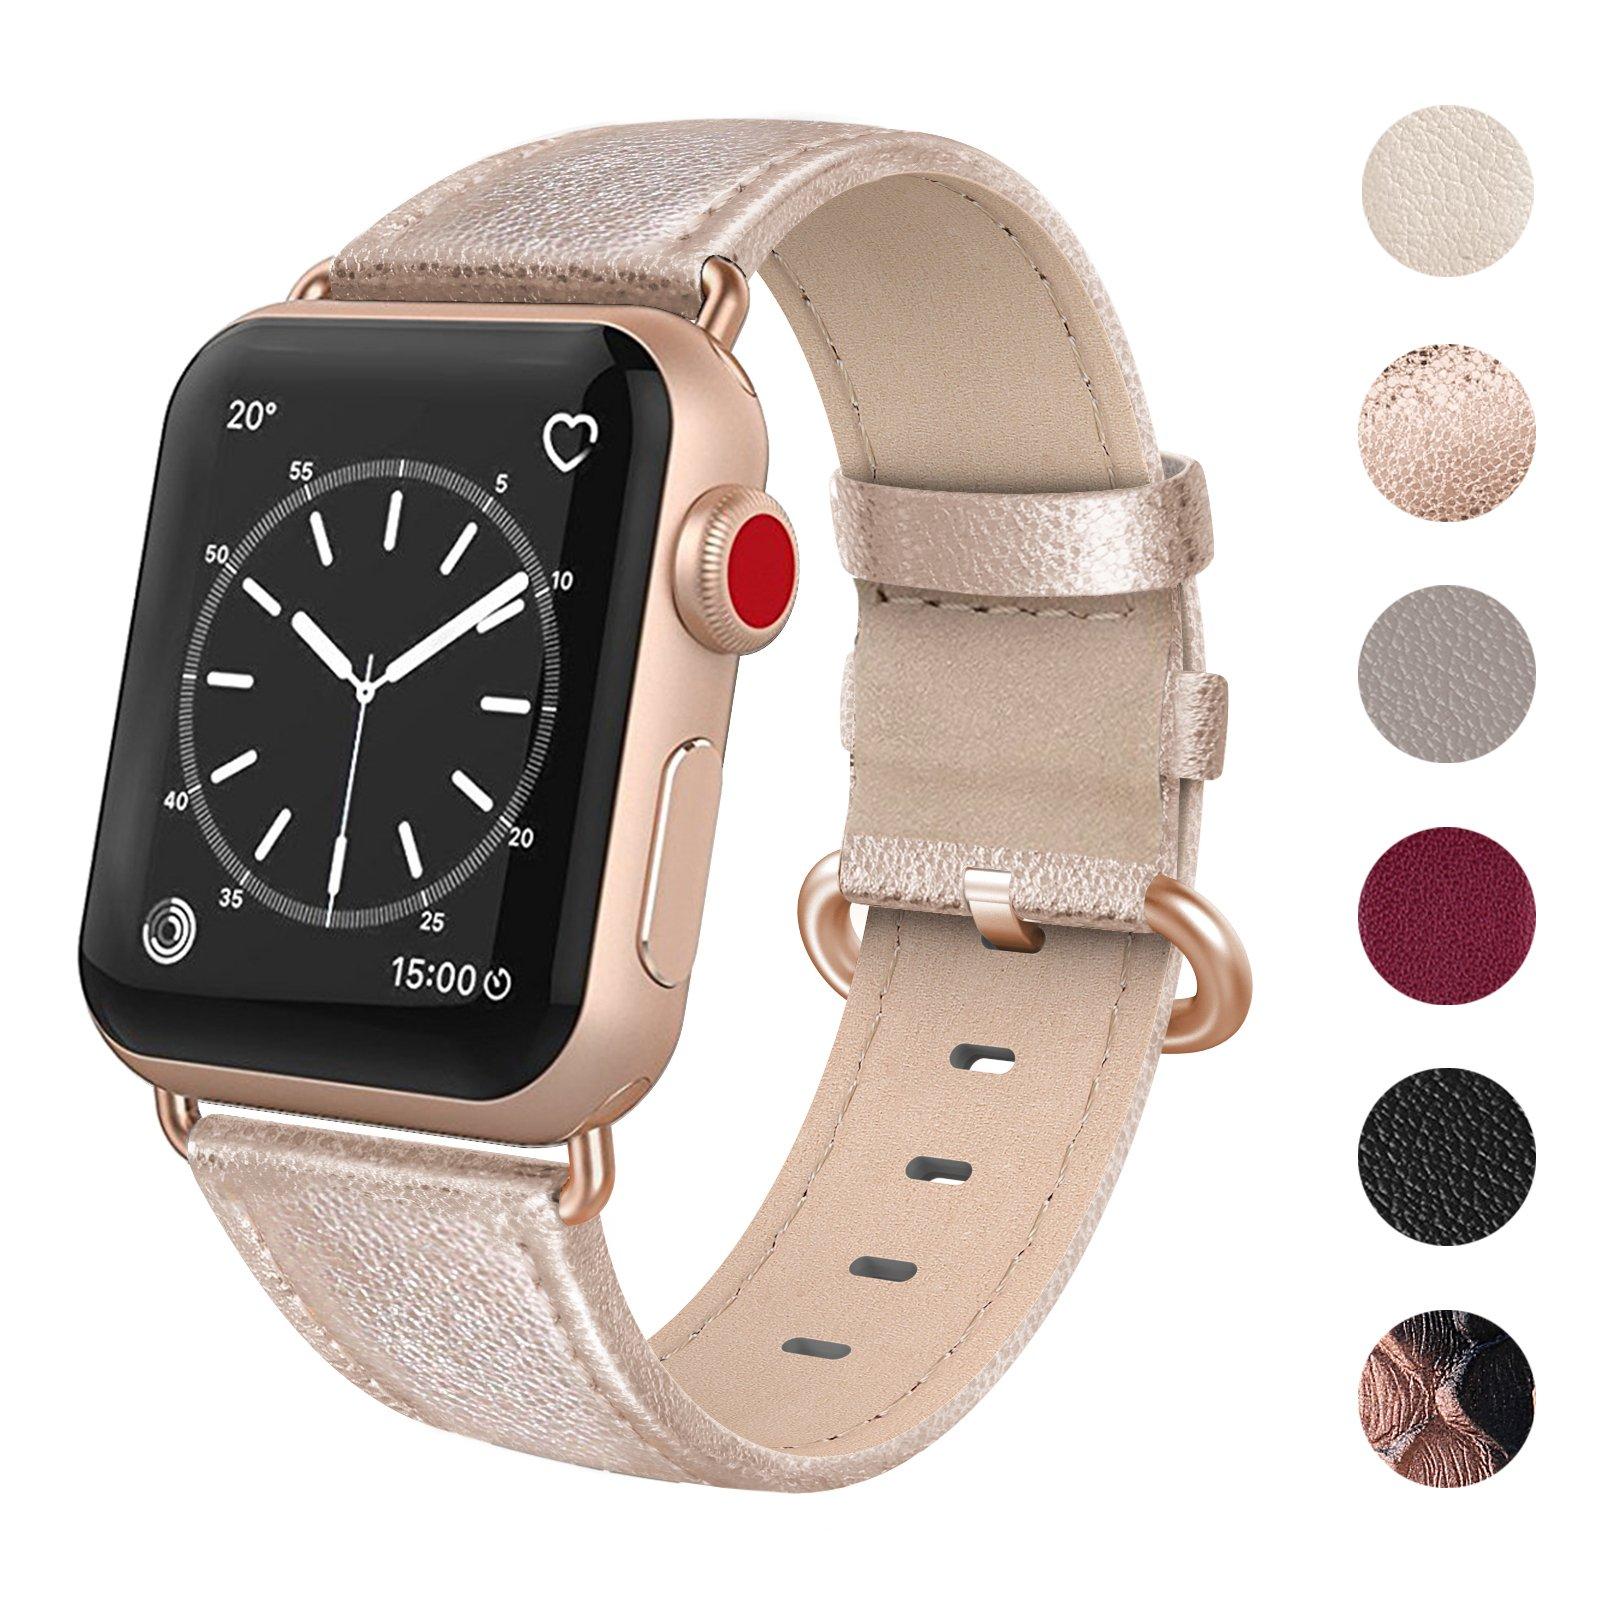 Apple Watch Bands Gold: Amazon.com